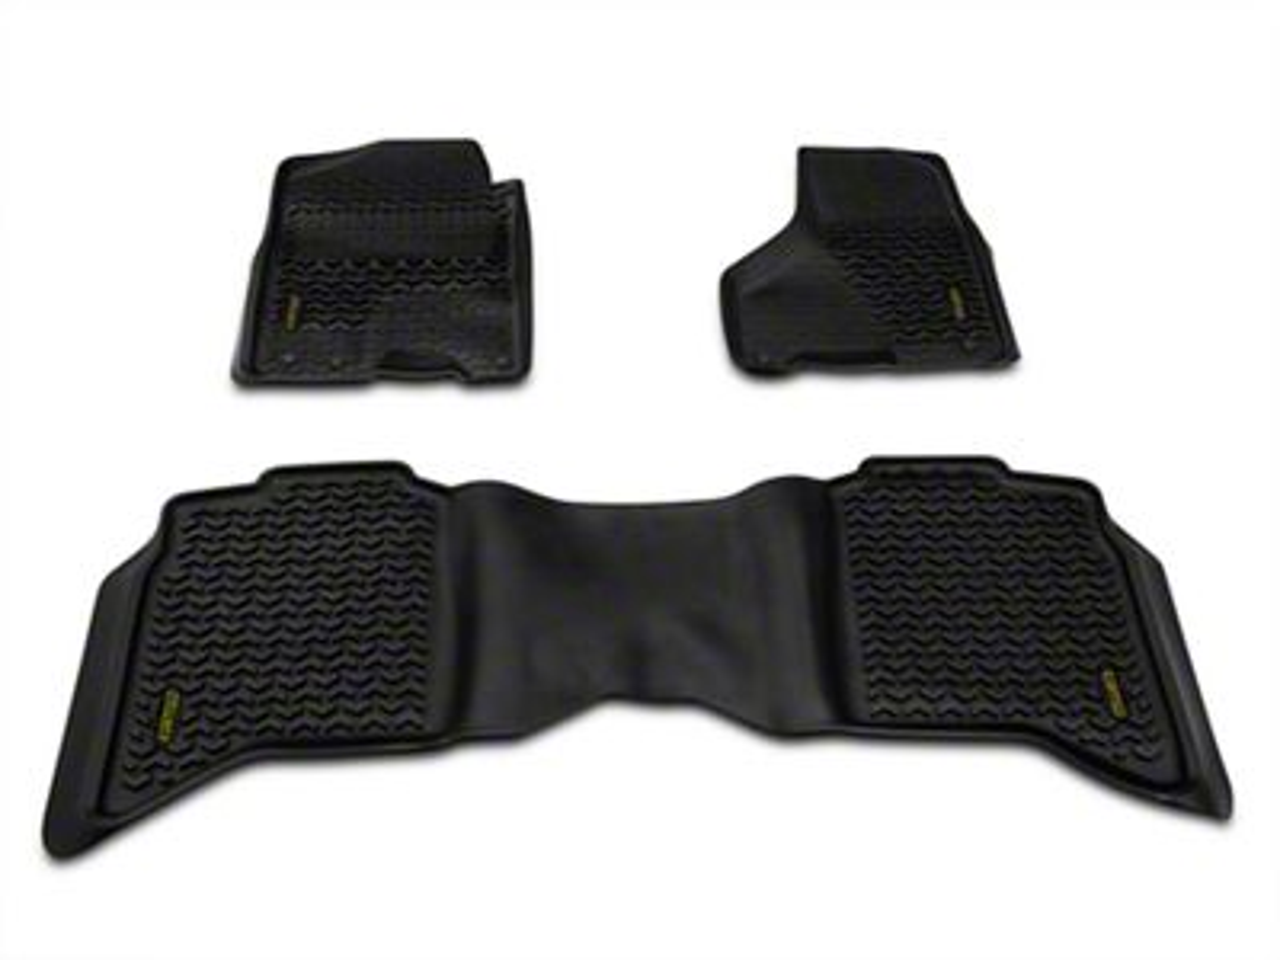 Barricade Front & Rear Floor Mats - Black (09-18 RAM 1500 Crew Cab)